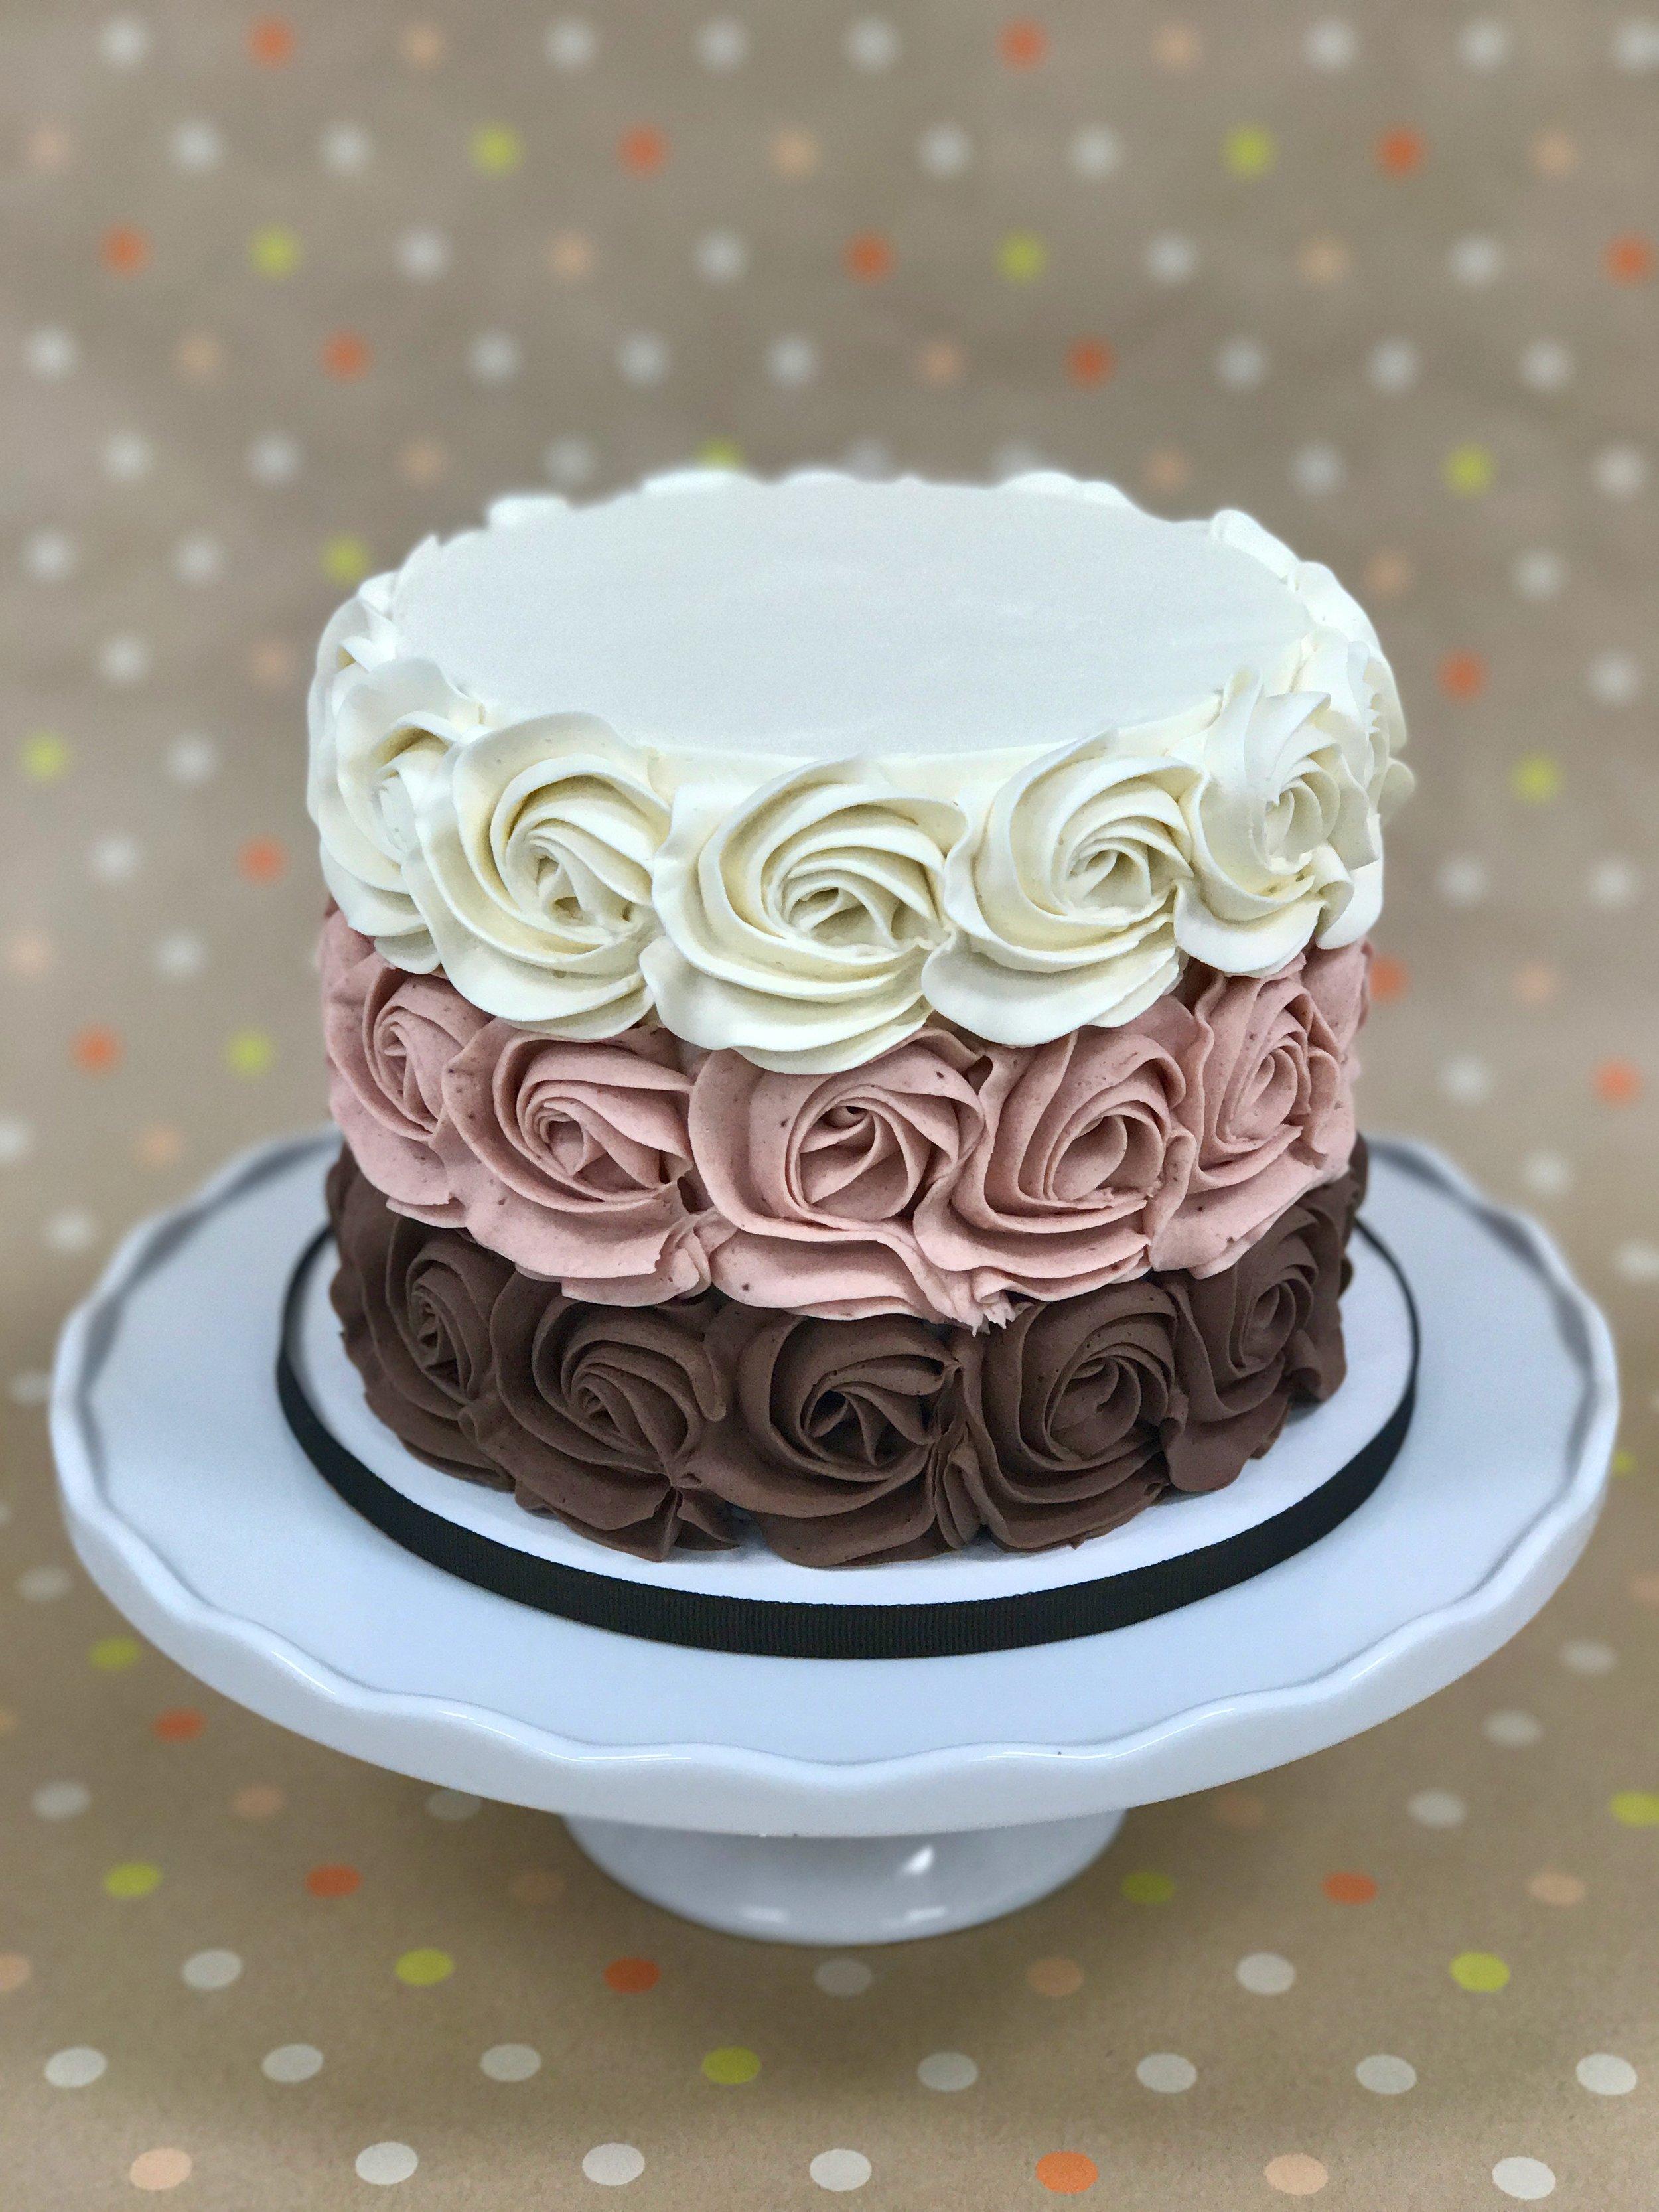 Neapolitan - Cake: Vanilla Bean and ChocolateFilling: Strawberry Swiss Meringue ButtercreamFrosting: Vanilla, Strawberry and Chocolate Swiss Meringue Buttercreams